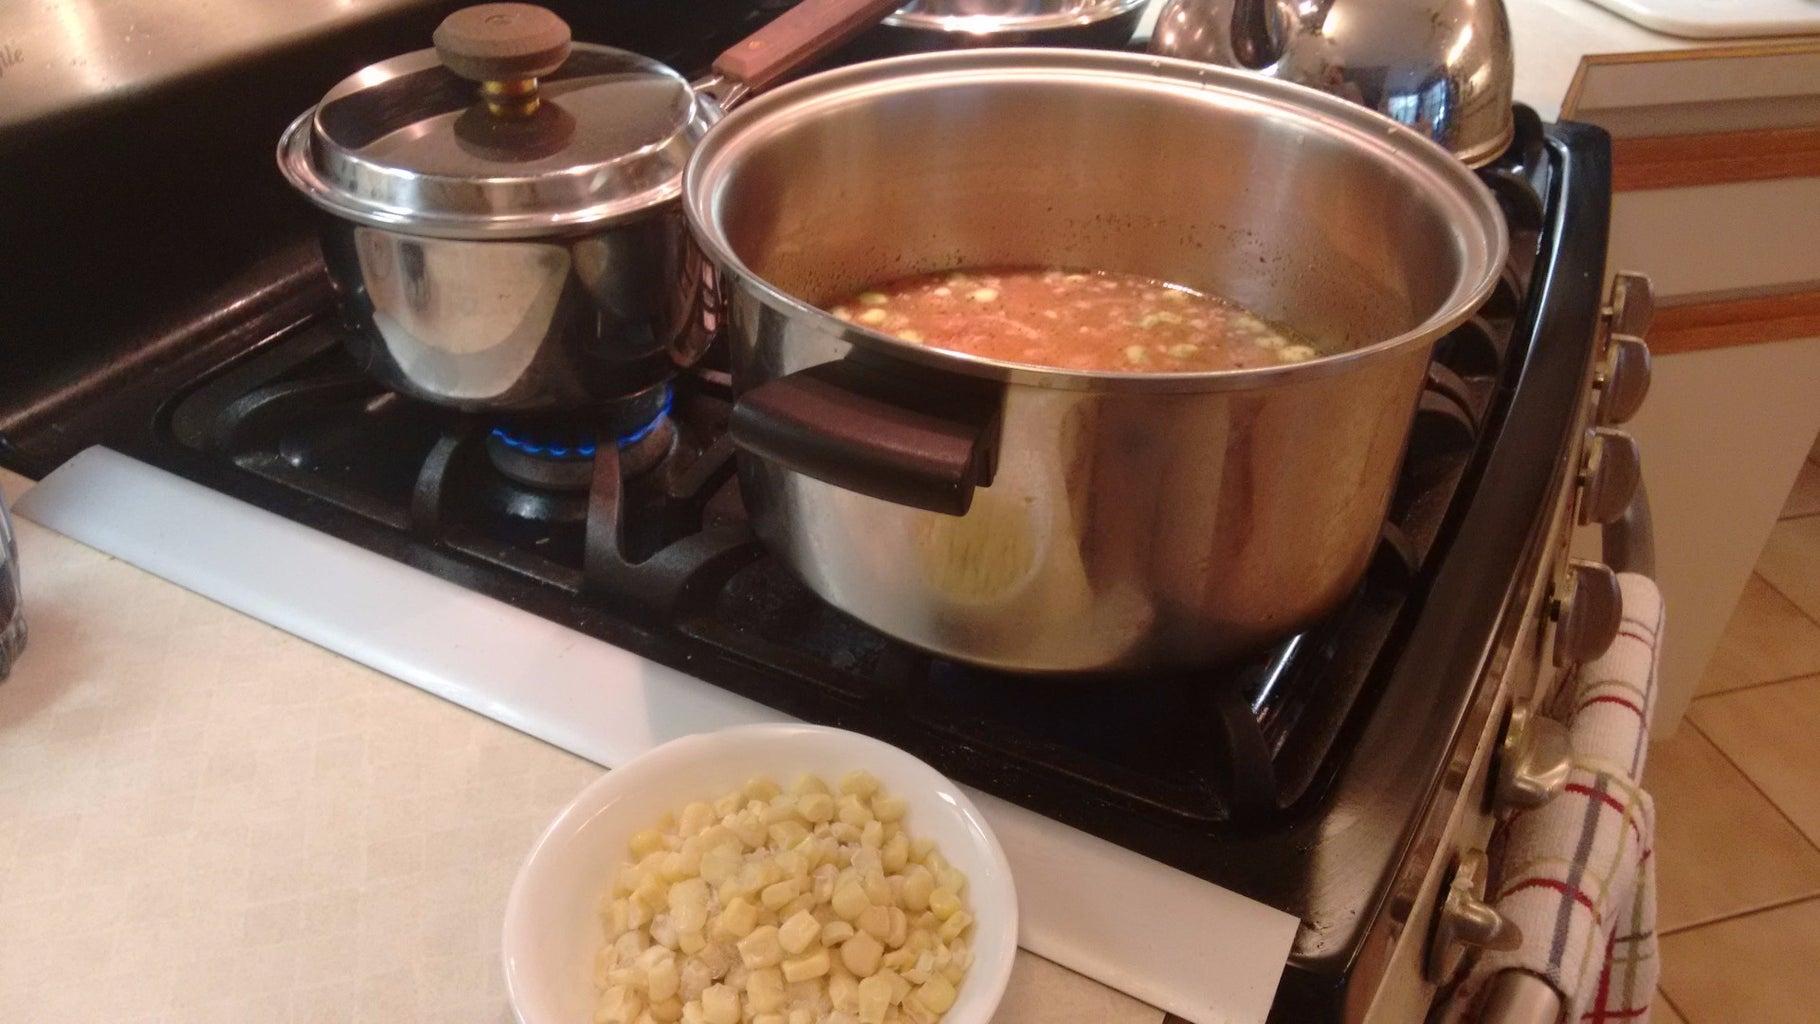 Add Potatoes and Limas